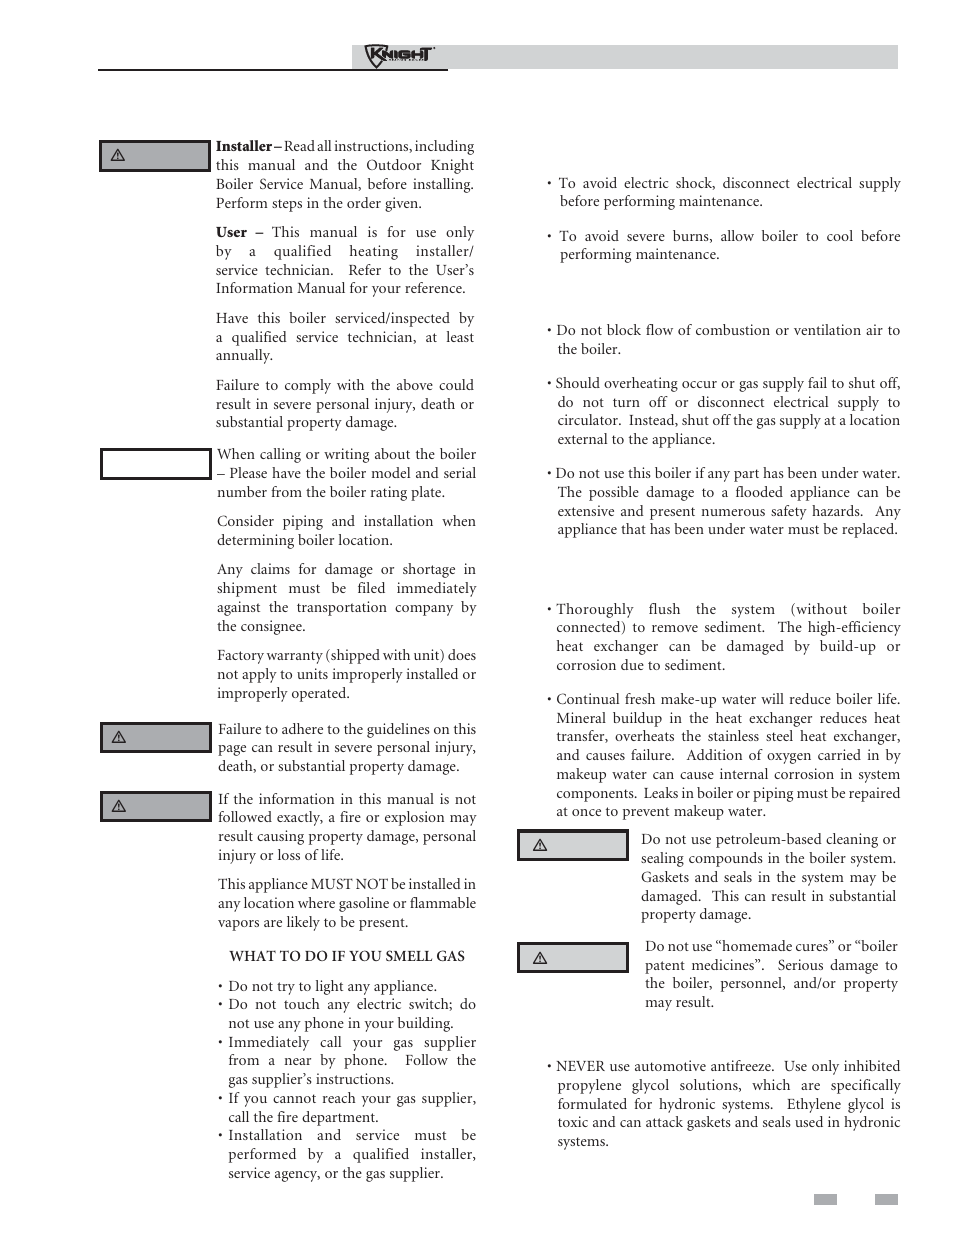 Please read before proceeding | Lochinvar Outdoor Knight Boiler 151 ...